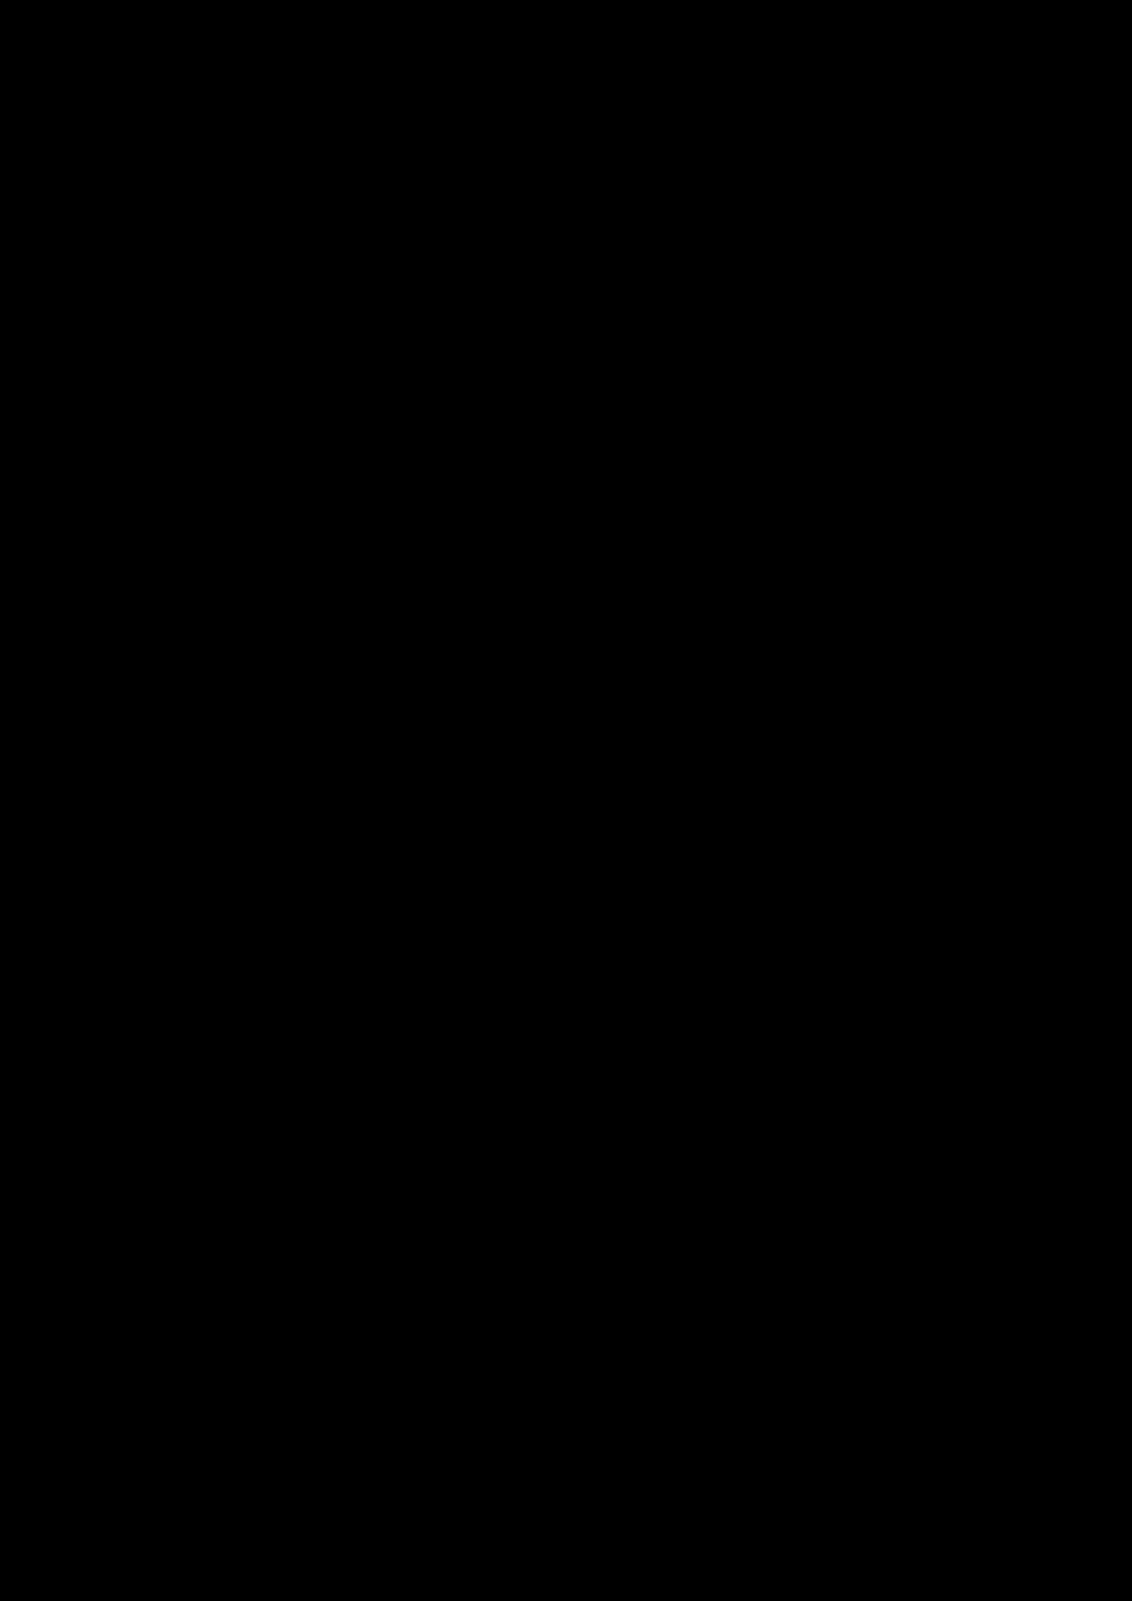 Ispoved Pervogo Boga slide, Image 20